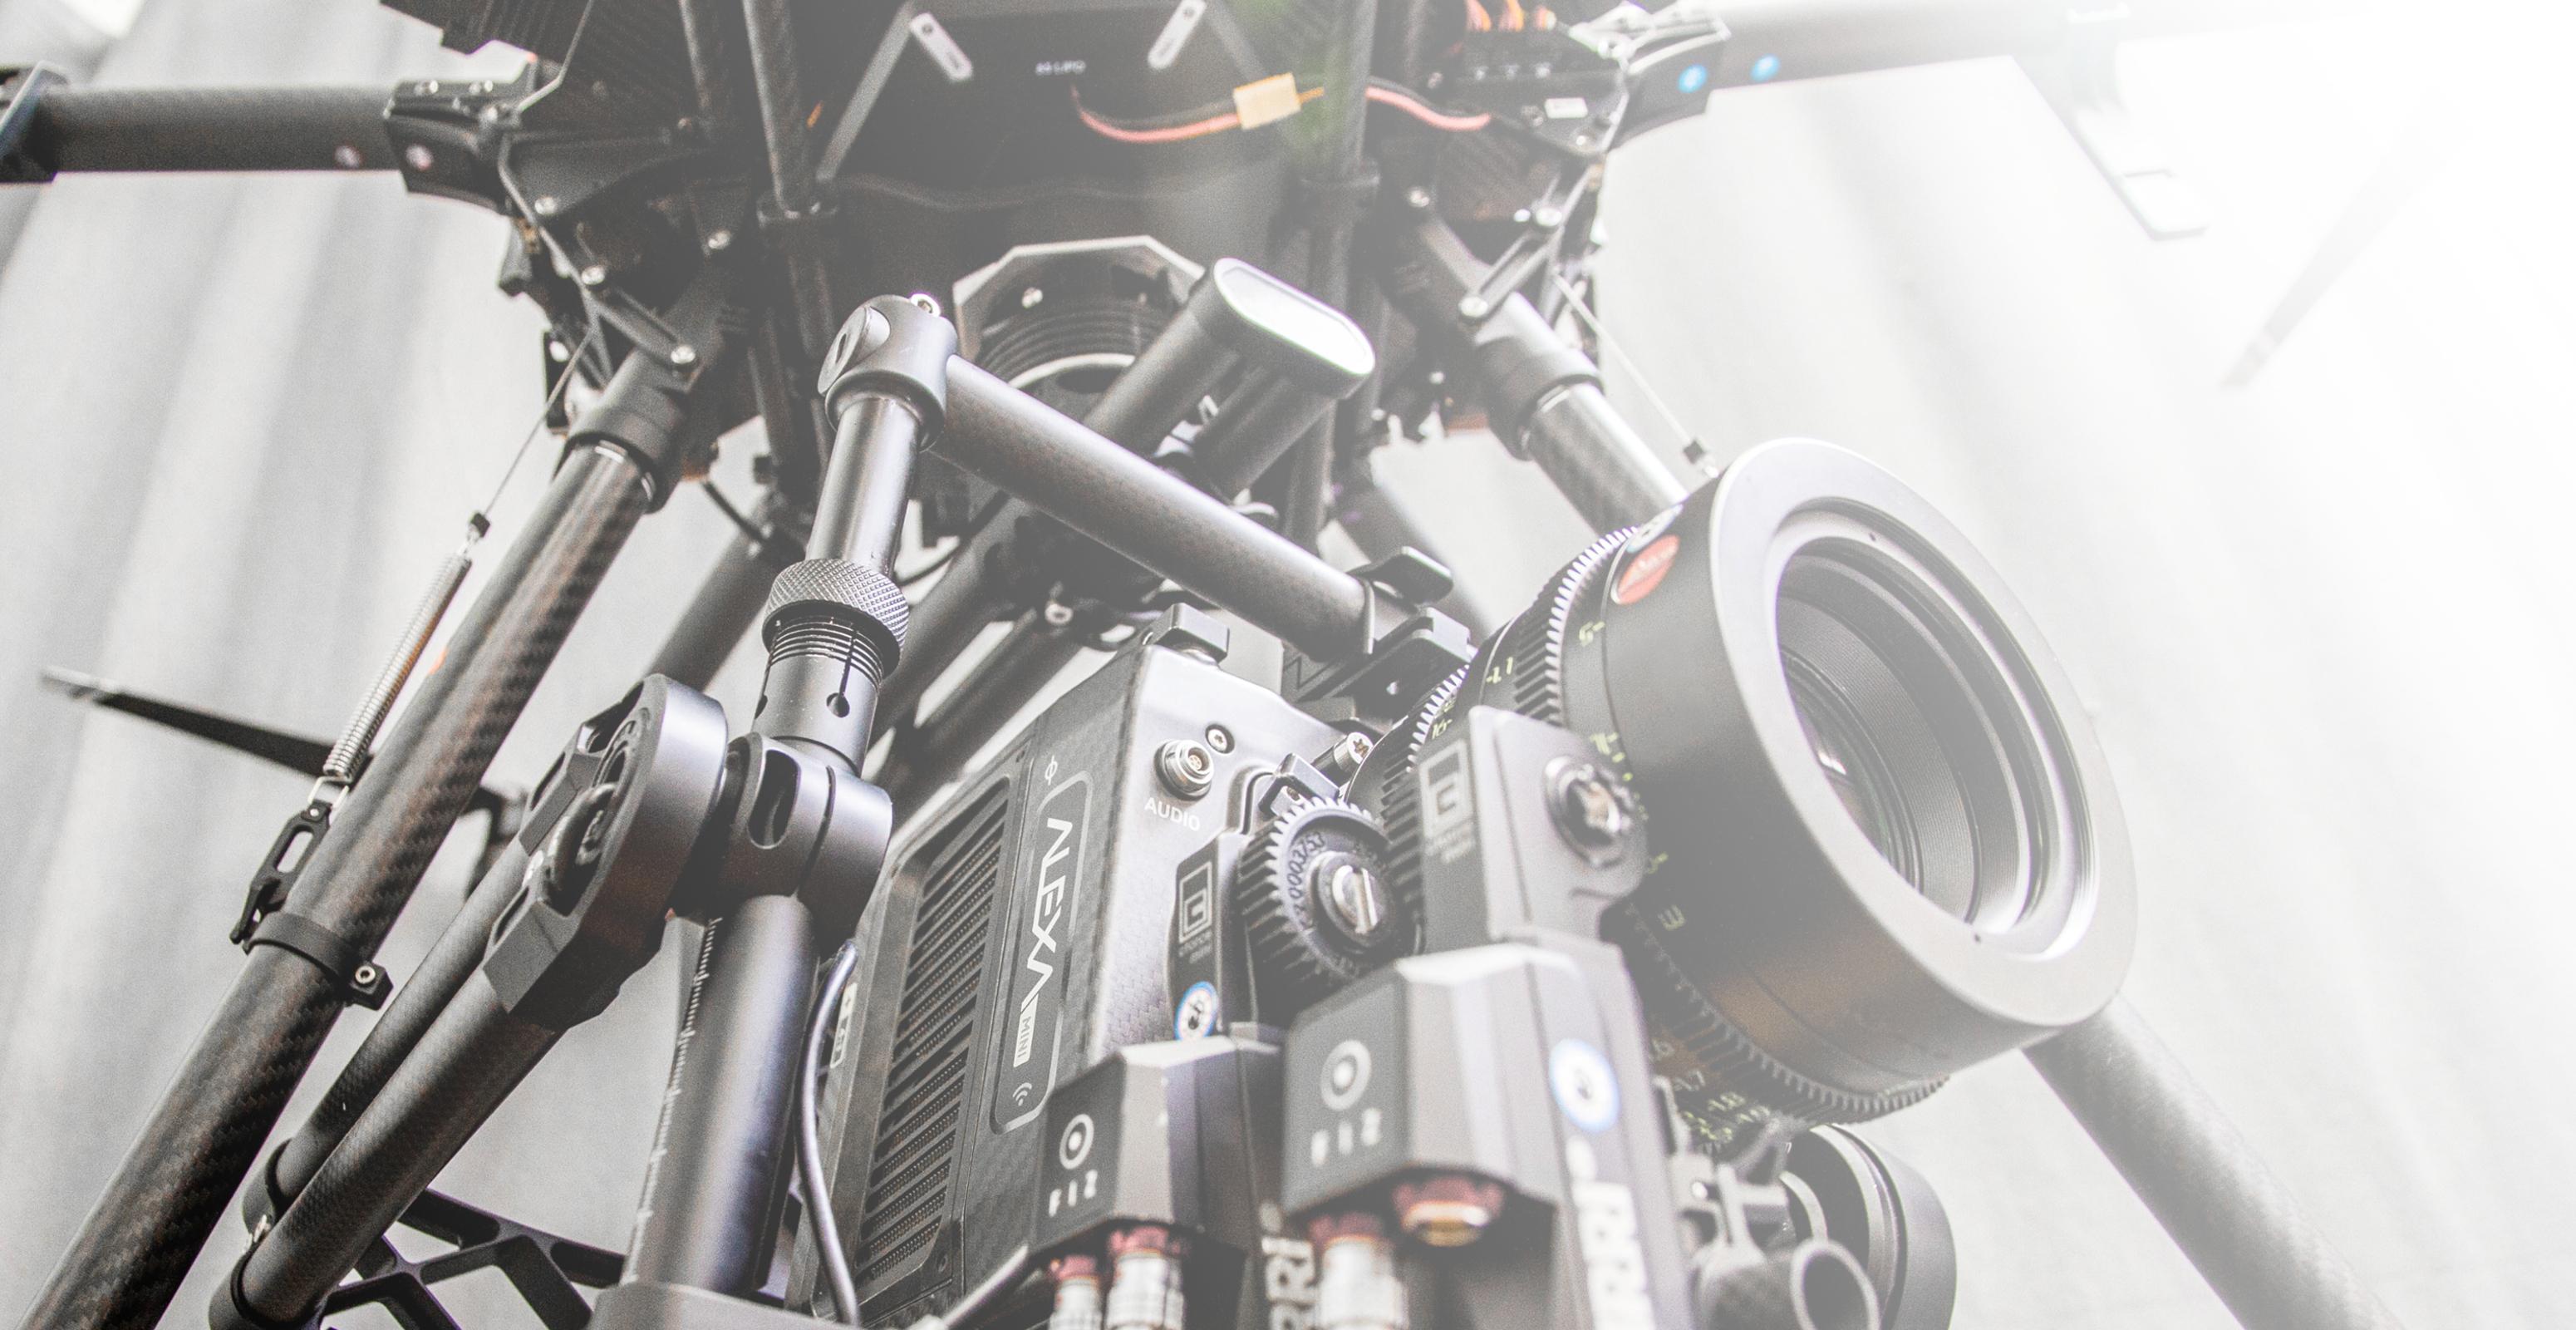 Arri Alexa Mini Drohne Flugaufnahmen Hexakopter DJI Matrice 600 pro Österreich Austro control Zulassung